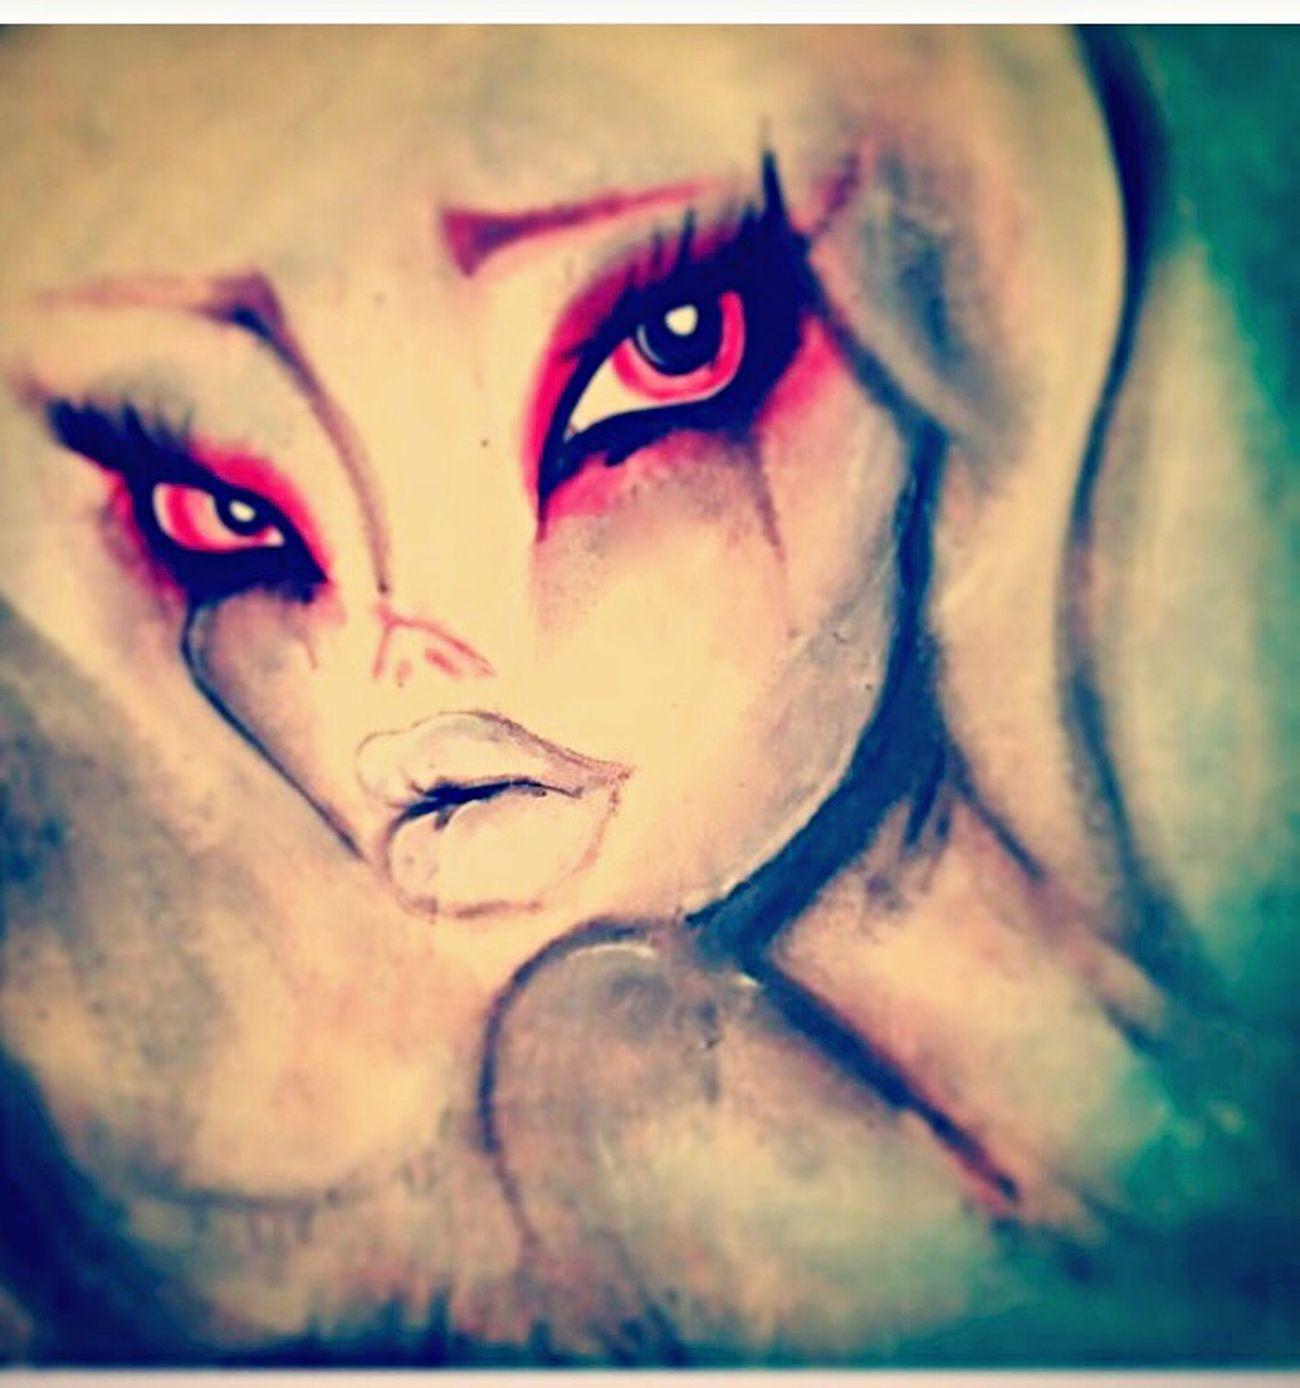 Art ArtWork Artist Art, Drawing, Creativity Myartwork MYArtwork❤ Myart♡ MyARTS Myartbook Artbyluvlee Art Gallery Artphotography Artsy Artart Arts Art Yourself Alien Alienesque Alienarts Aliens Faeiry Fairy Fairyart Womanart Beauty